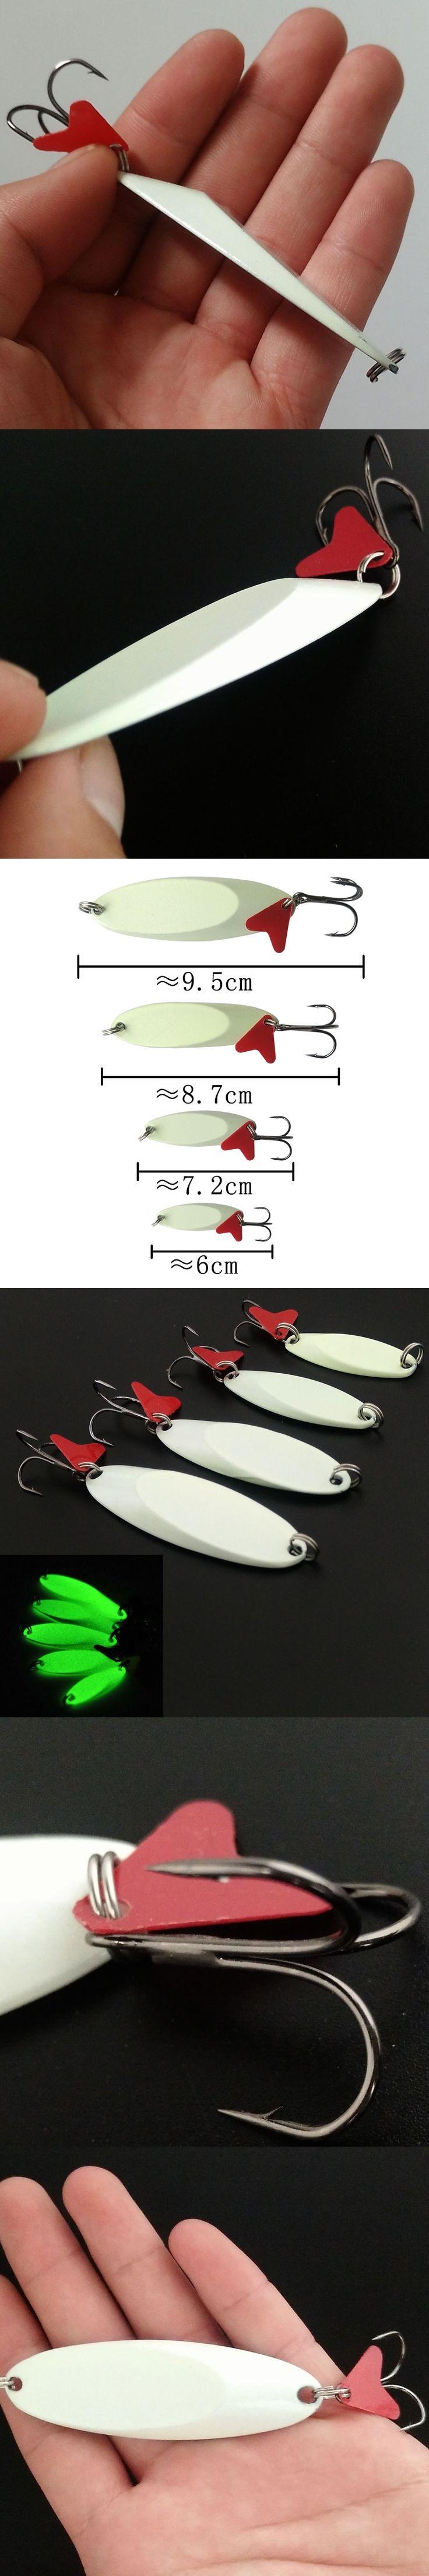 Metal Spinner Lure Spoon Carp Fishing Lure 7g/11/22g Luminous Hard Baits For Fishing Sequins Speaker Fishing Goods Accessories